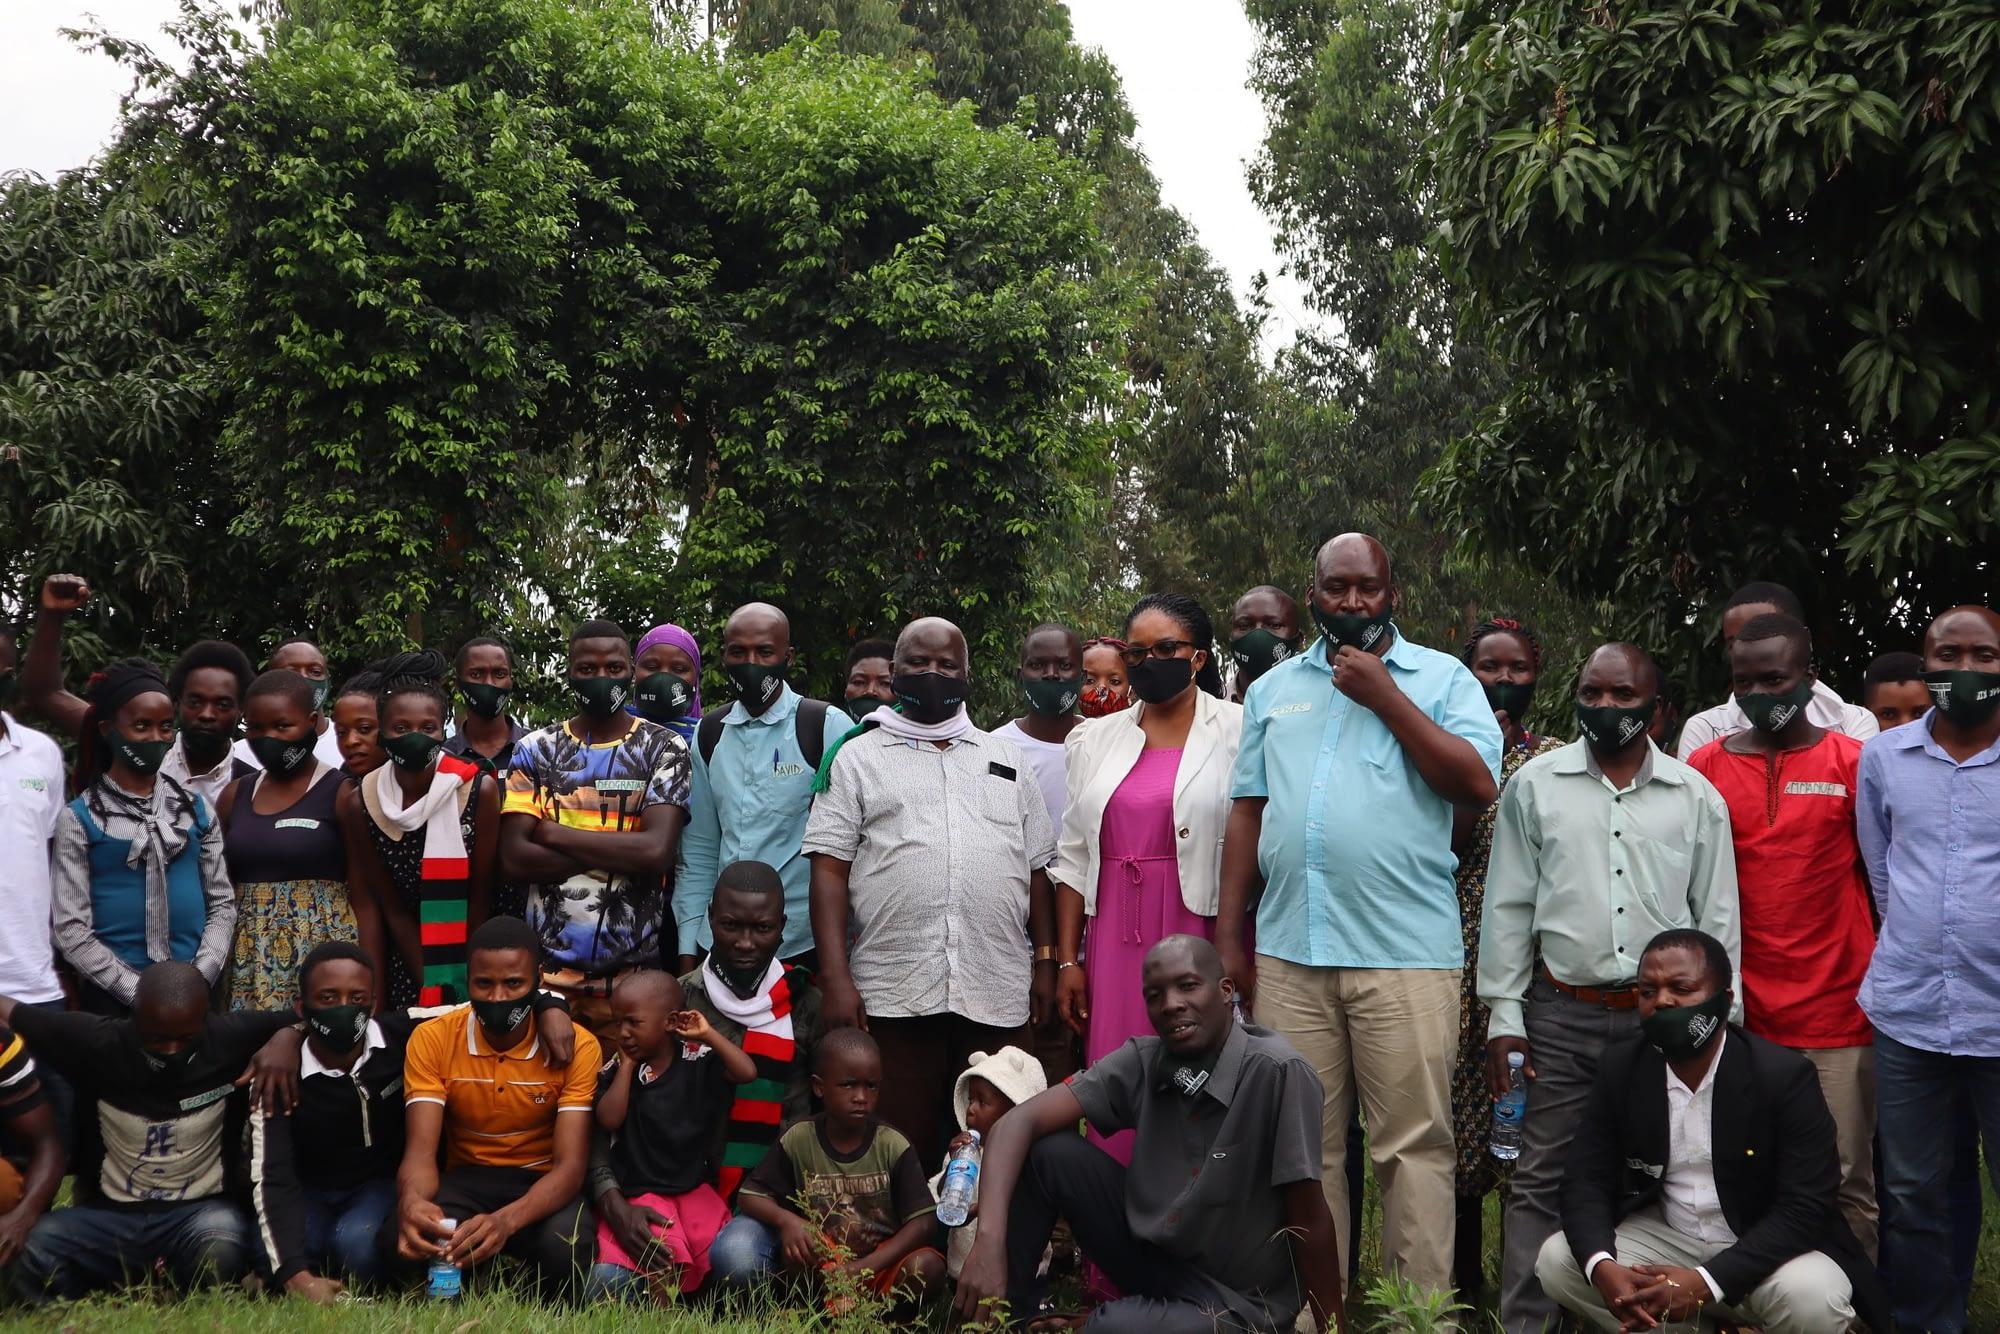 Makerere University community theatre participants at Kirimya in Masaka, Uganda (Cleodelia Nanjuba)